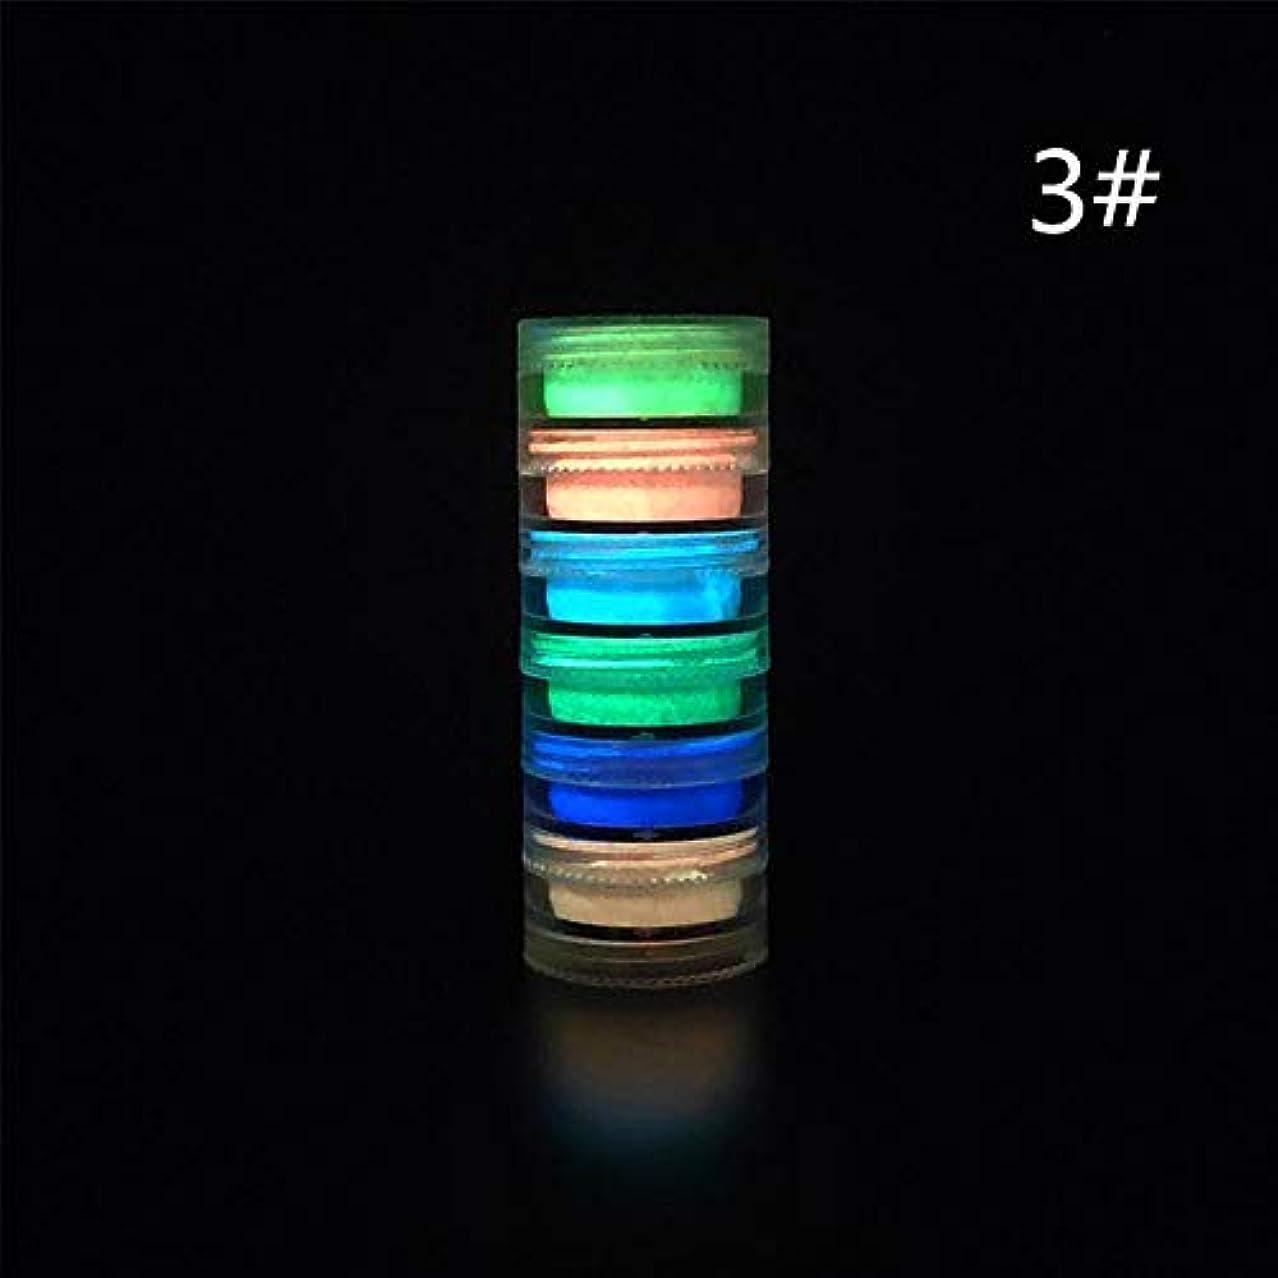 BETTER YOU (ベター ュー) 夜光パウダー ネイルグリッターパウダー 高輝度 ネオン蛍光体 ステッカー